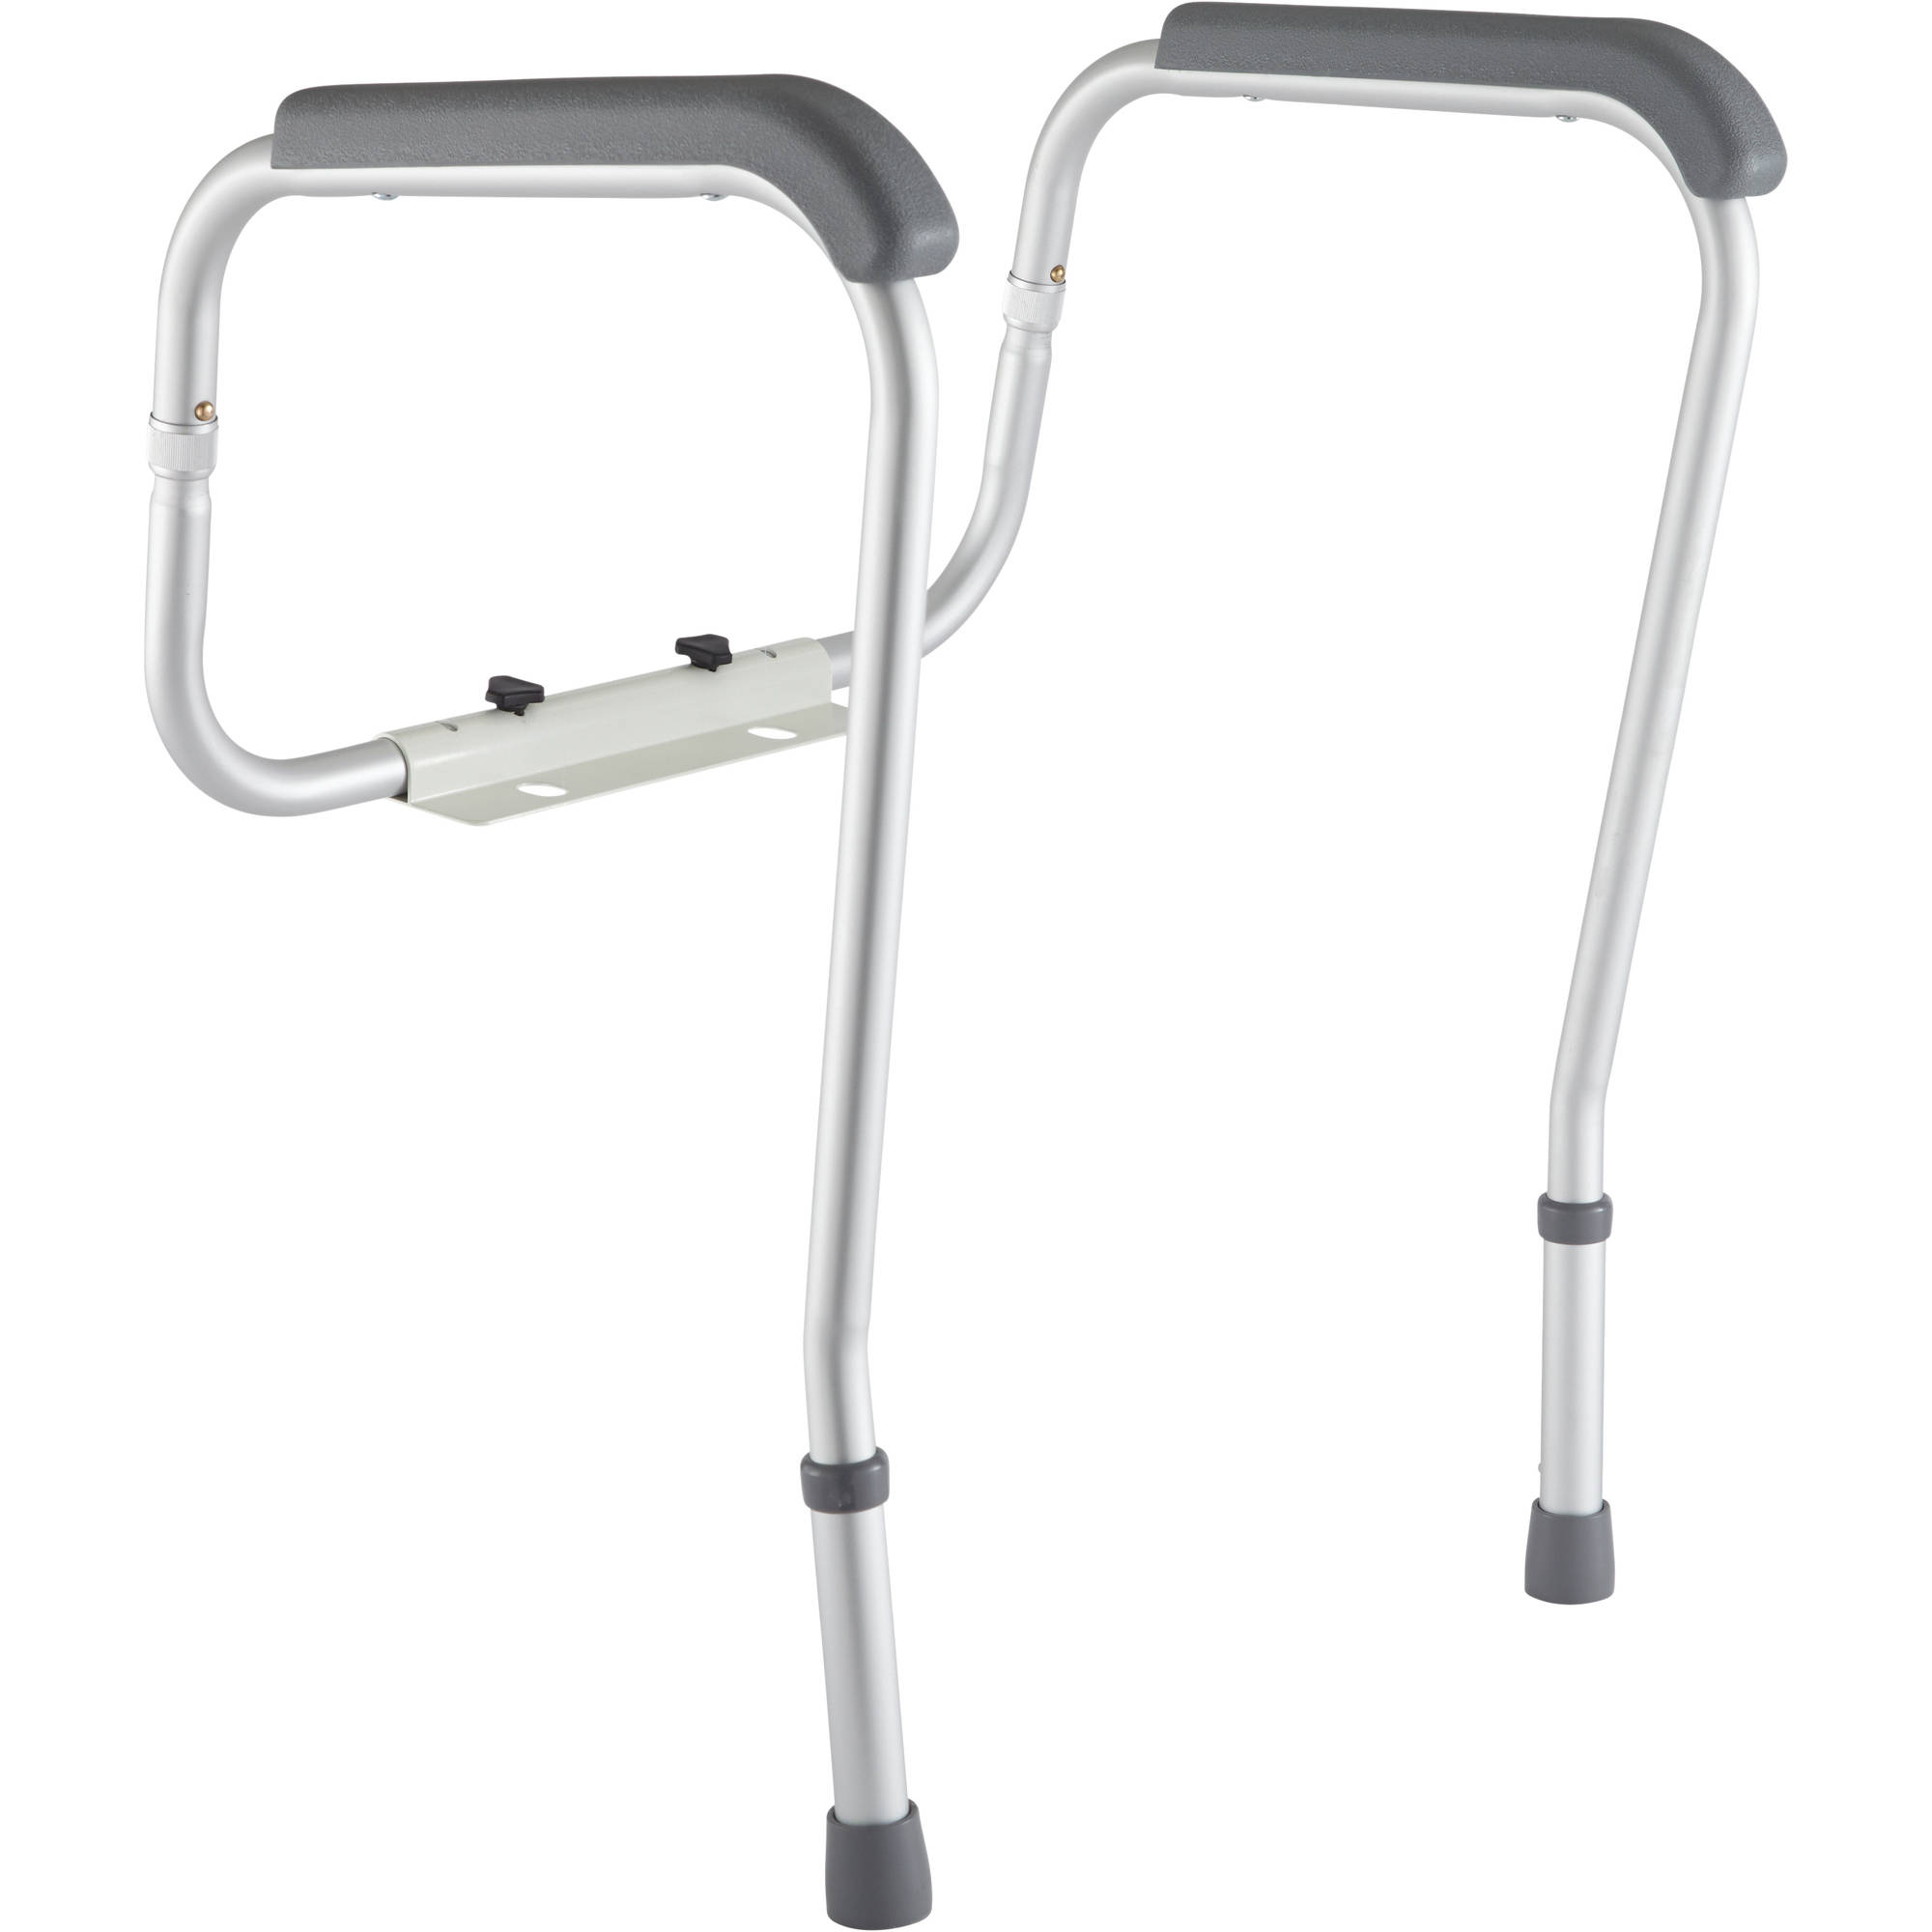 medline toilet safety frame rails - walmart